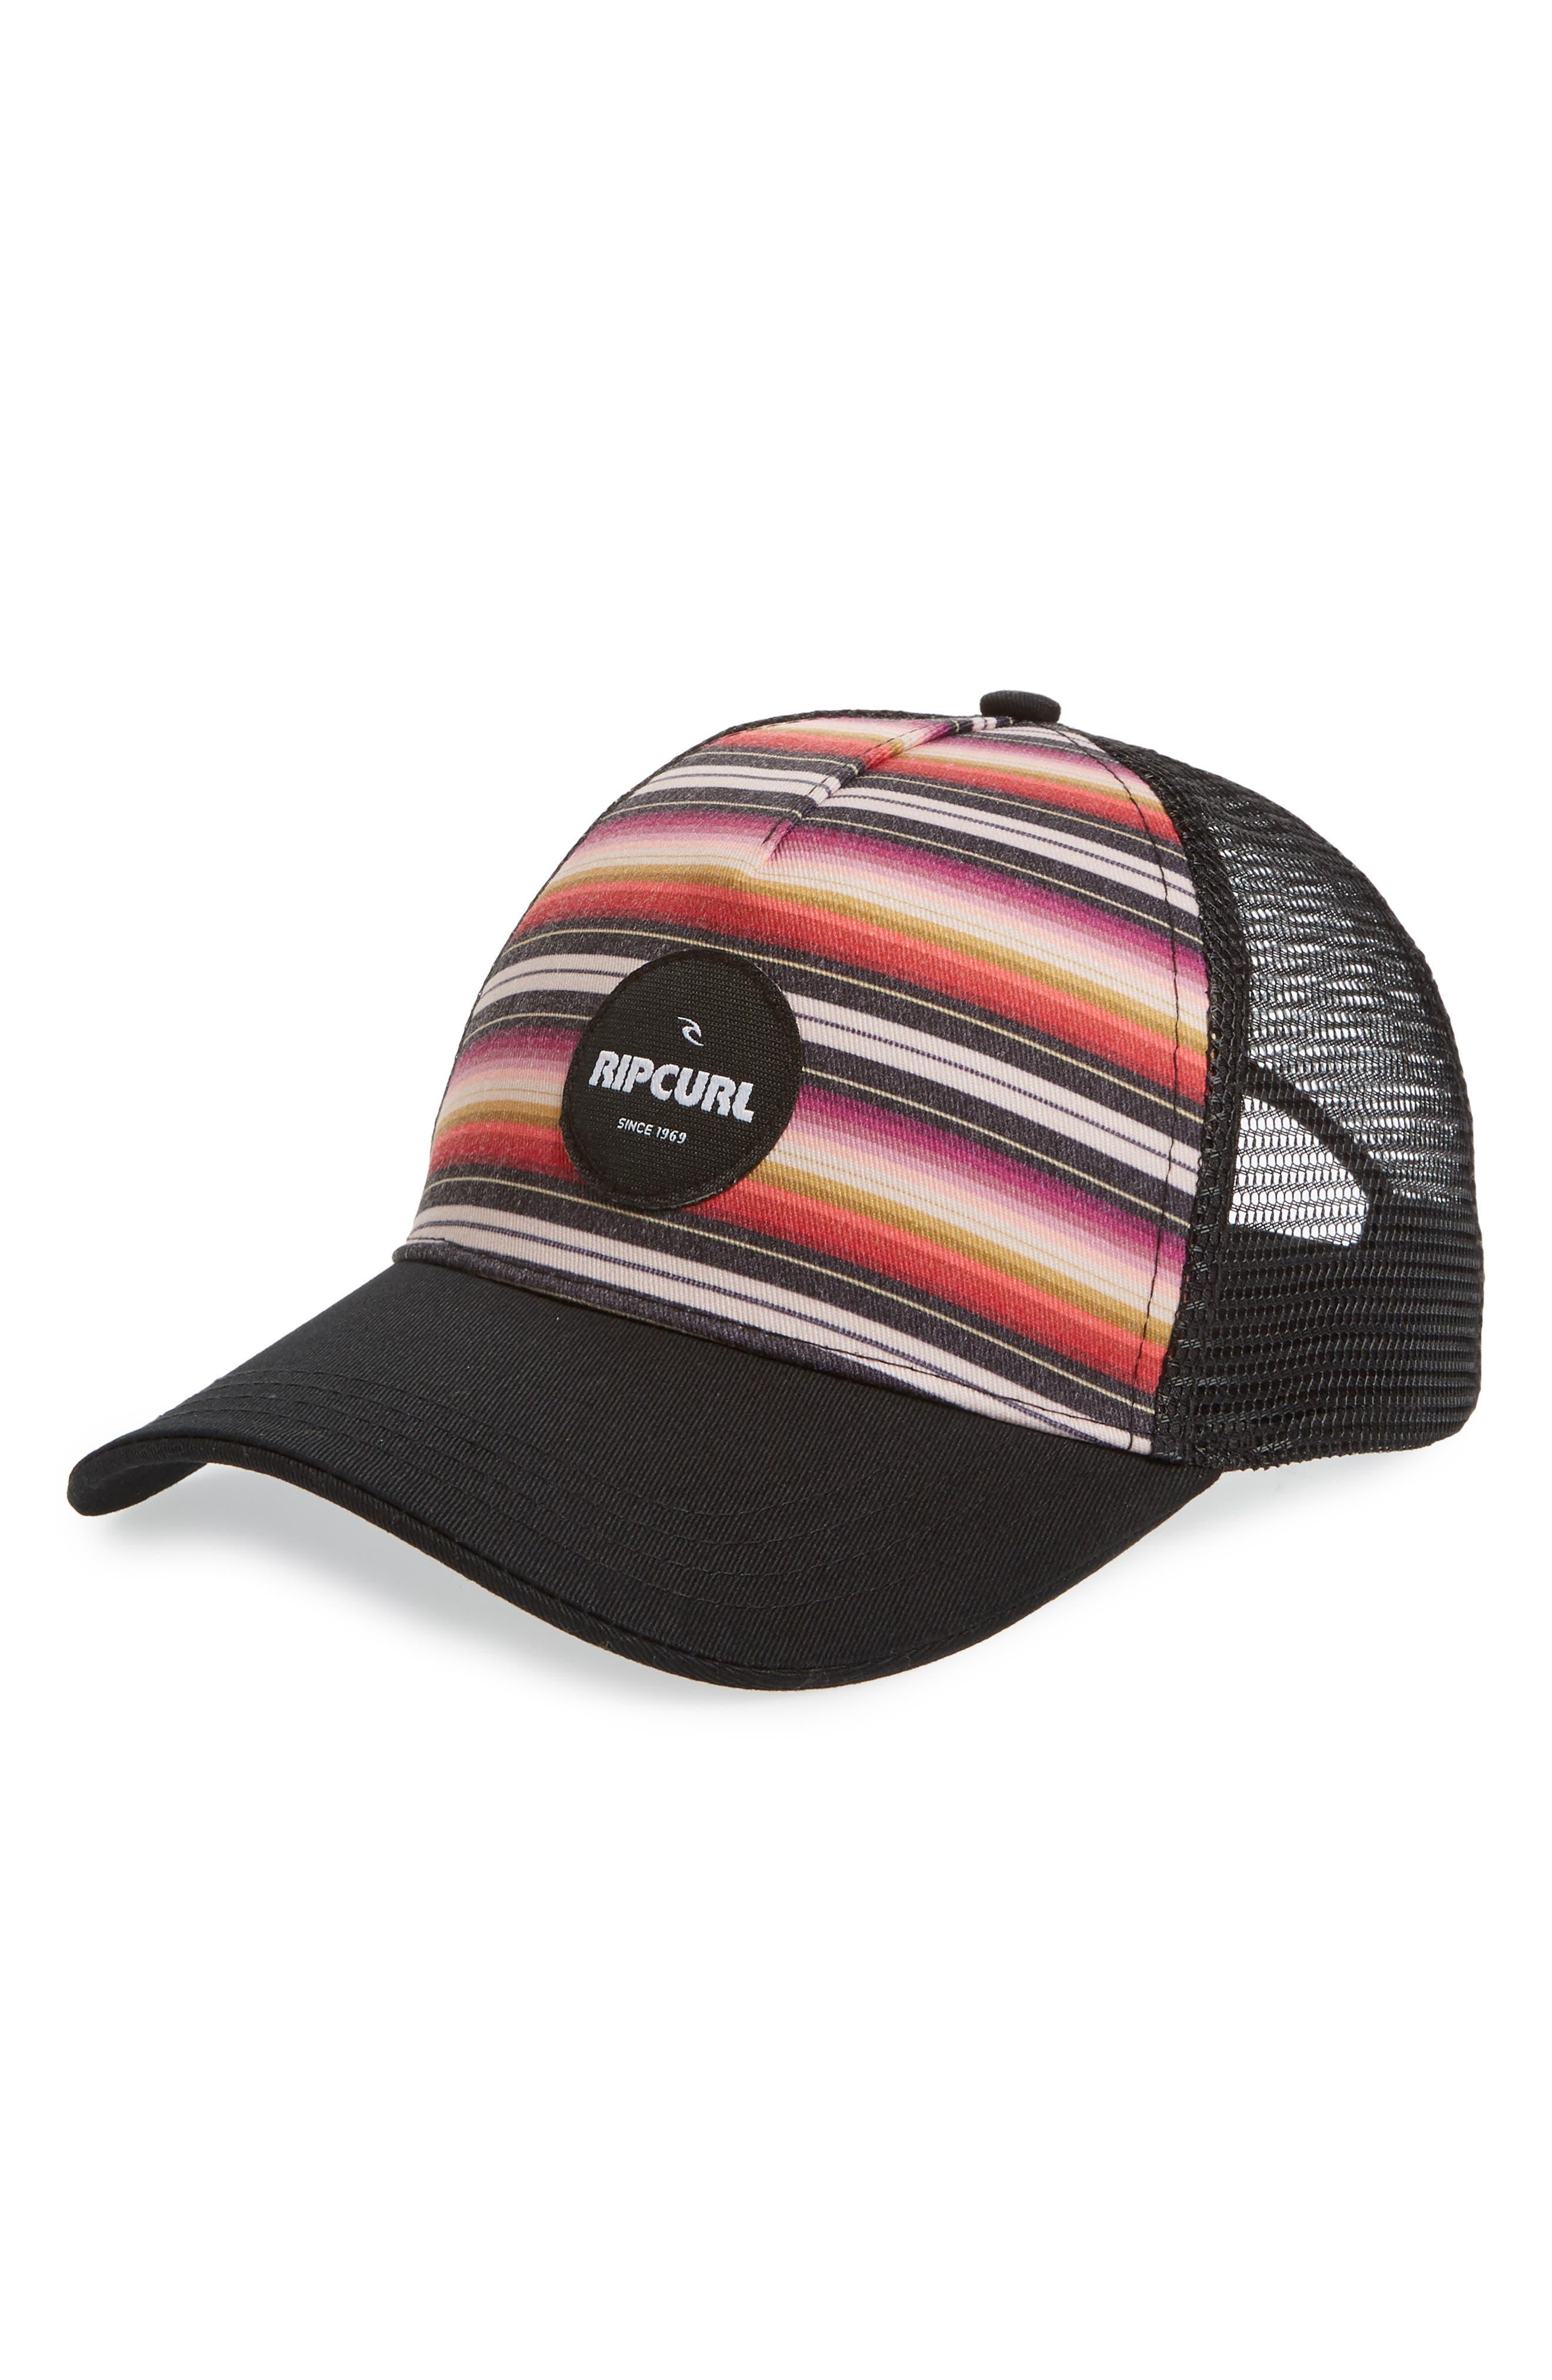 Sayulita Trucker Hat,                         Main,                         color, Black